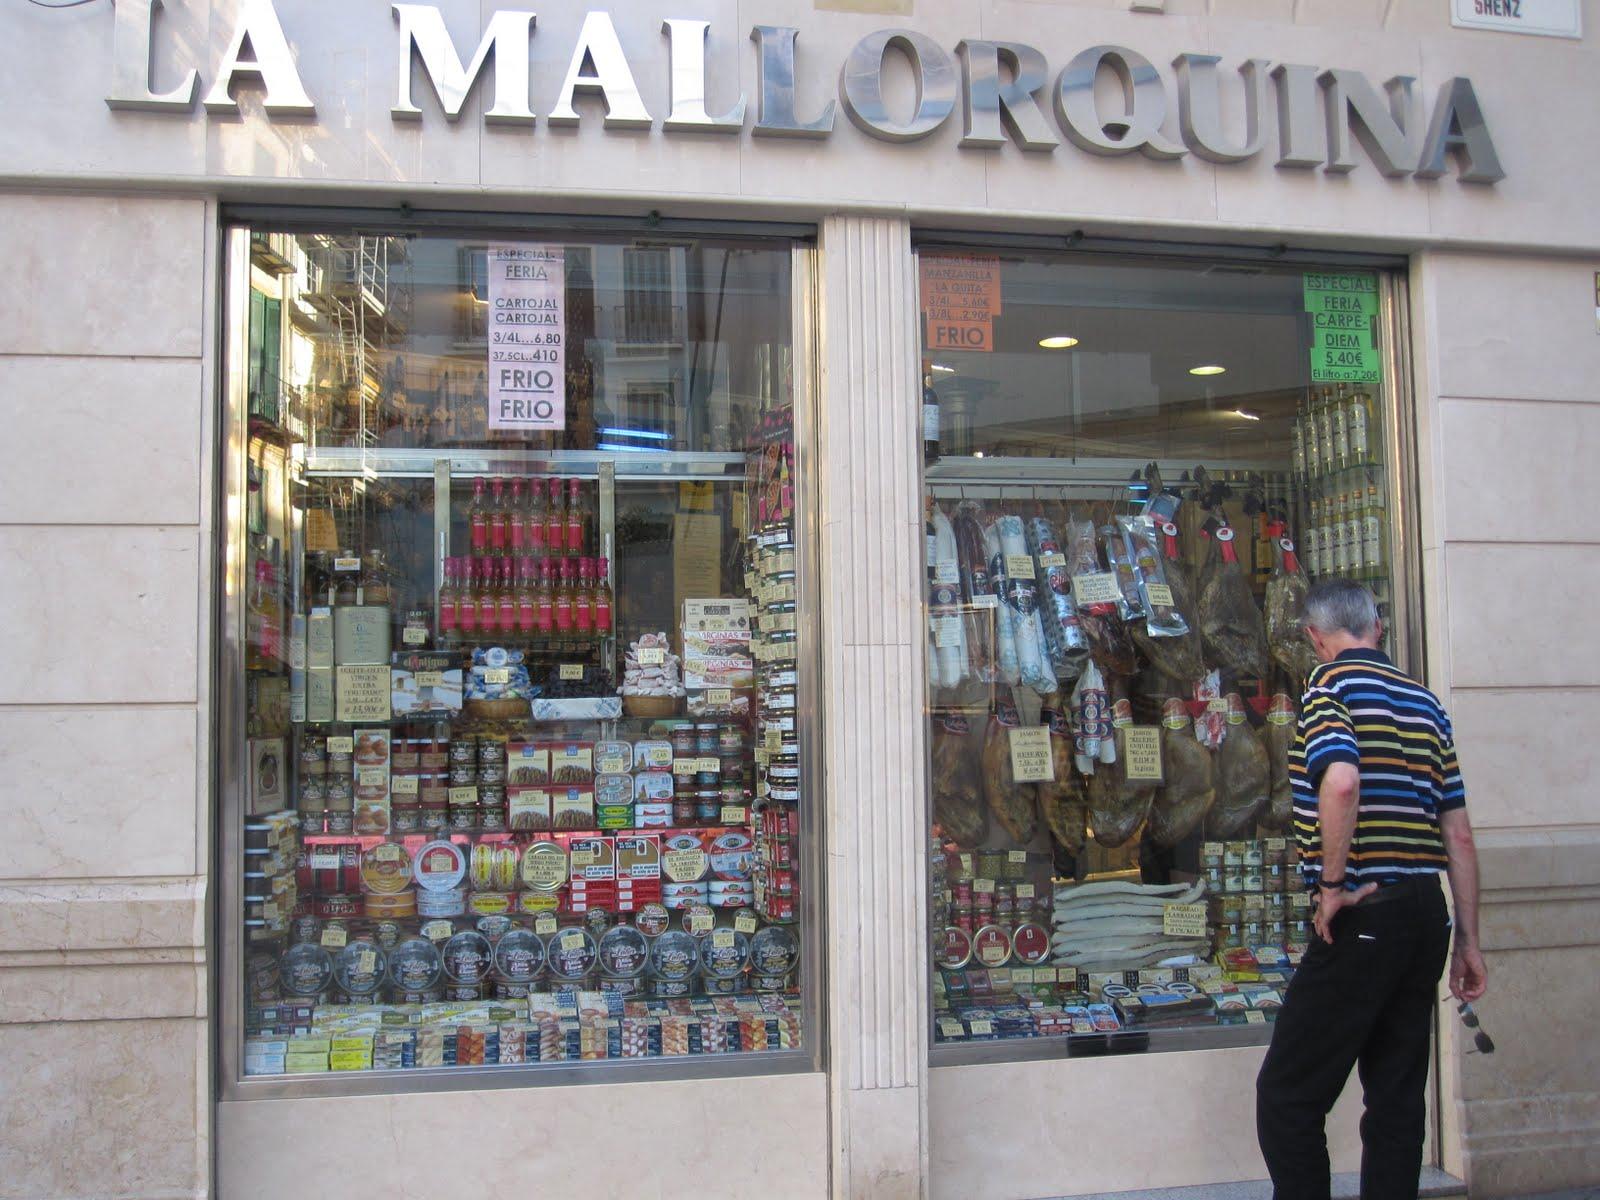 Globobl globobl en andaluc a gastronomia la - La mallorquina barcelona ...